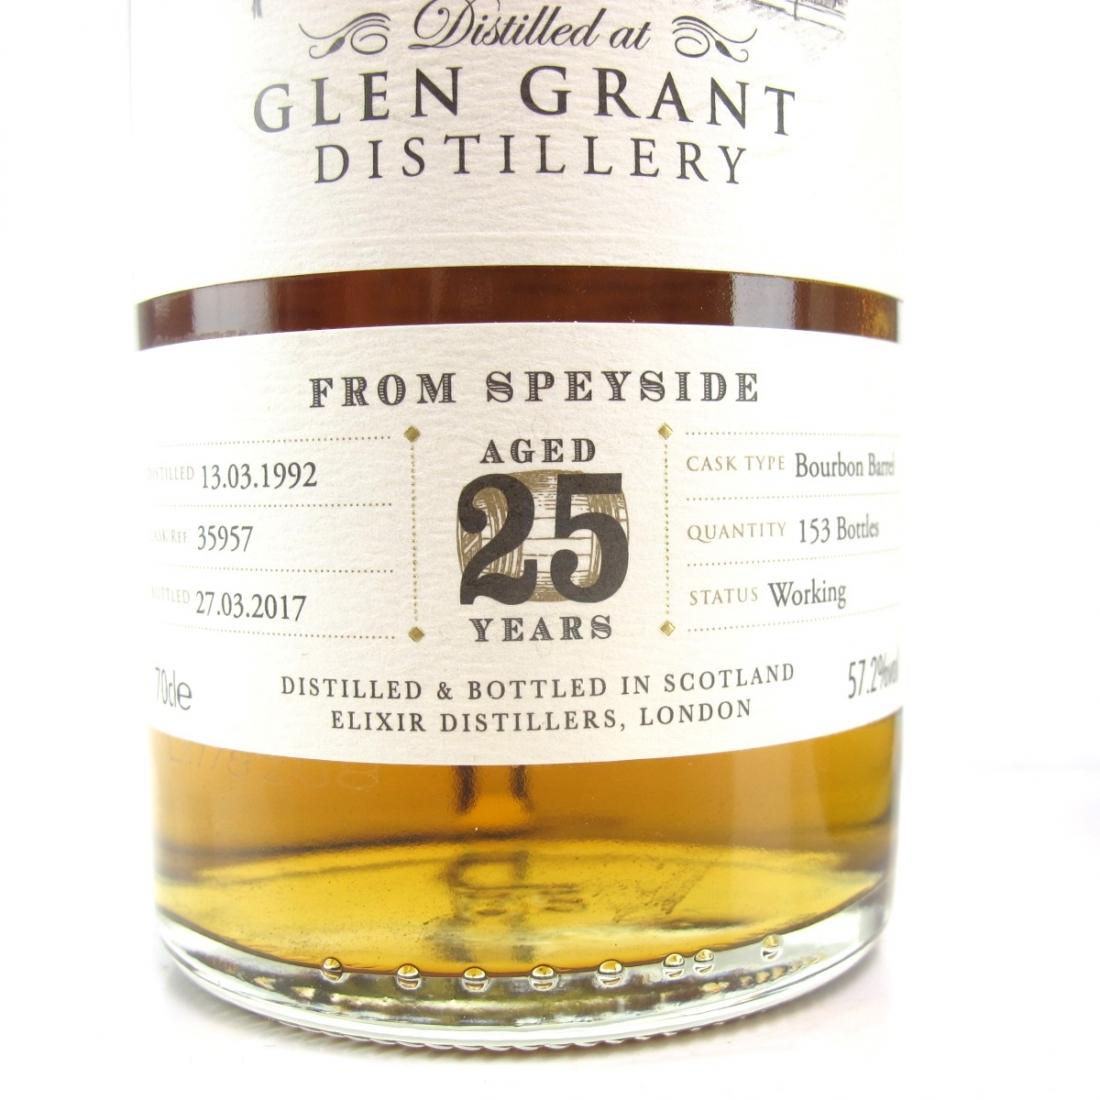 Glen Grant 1992 Single Malts of Scotland 25 Year Old